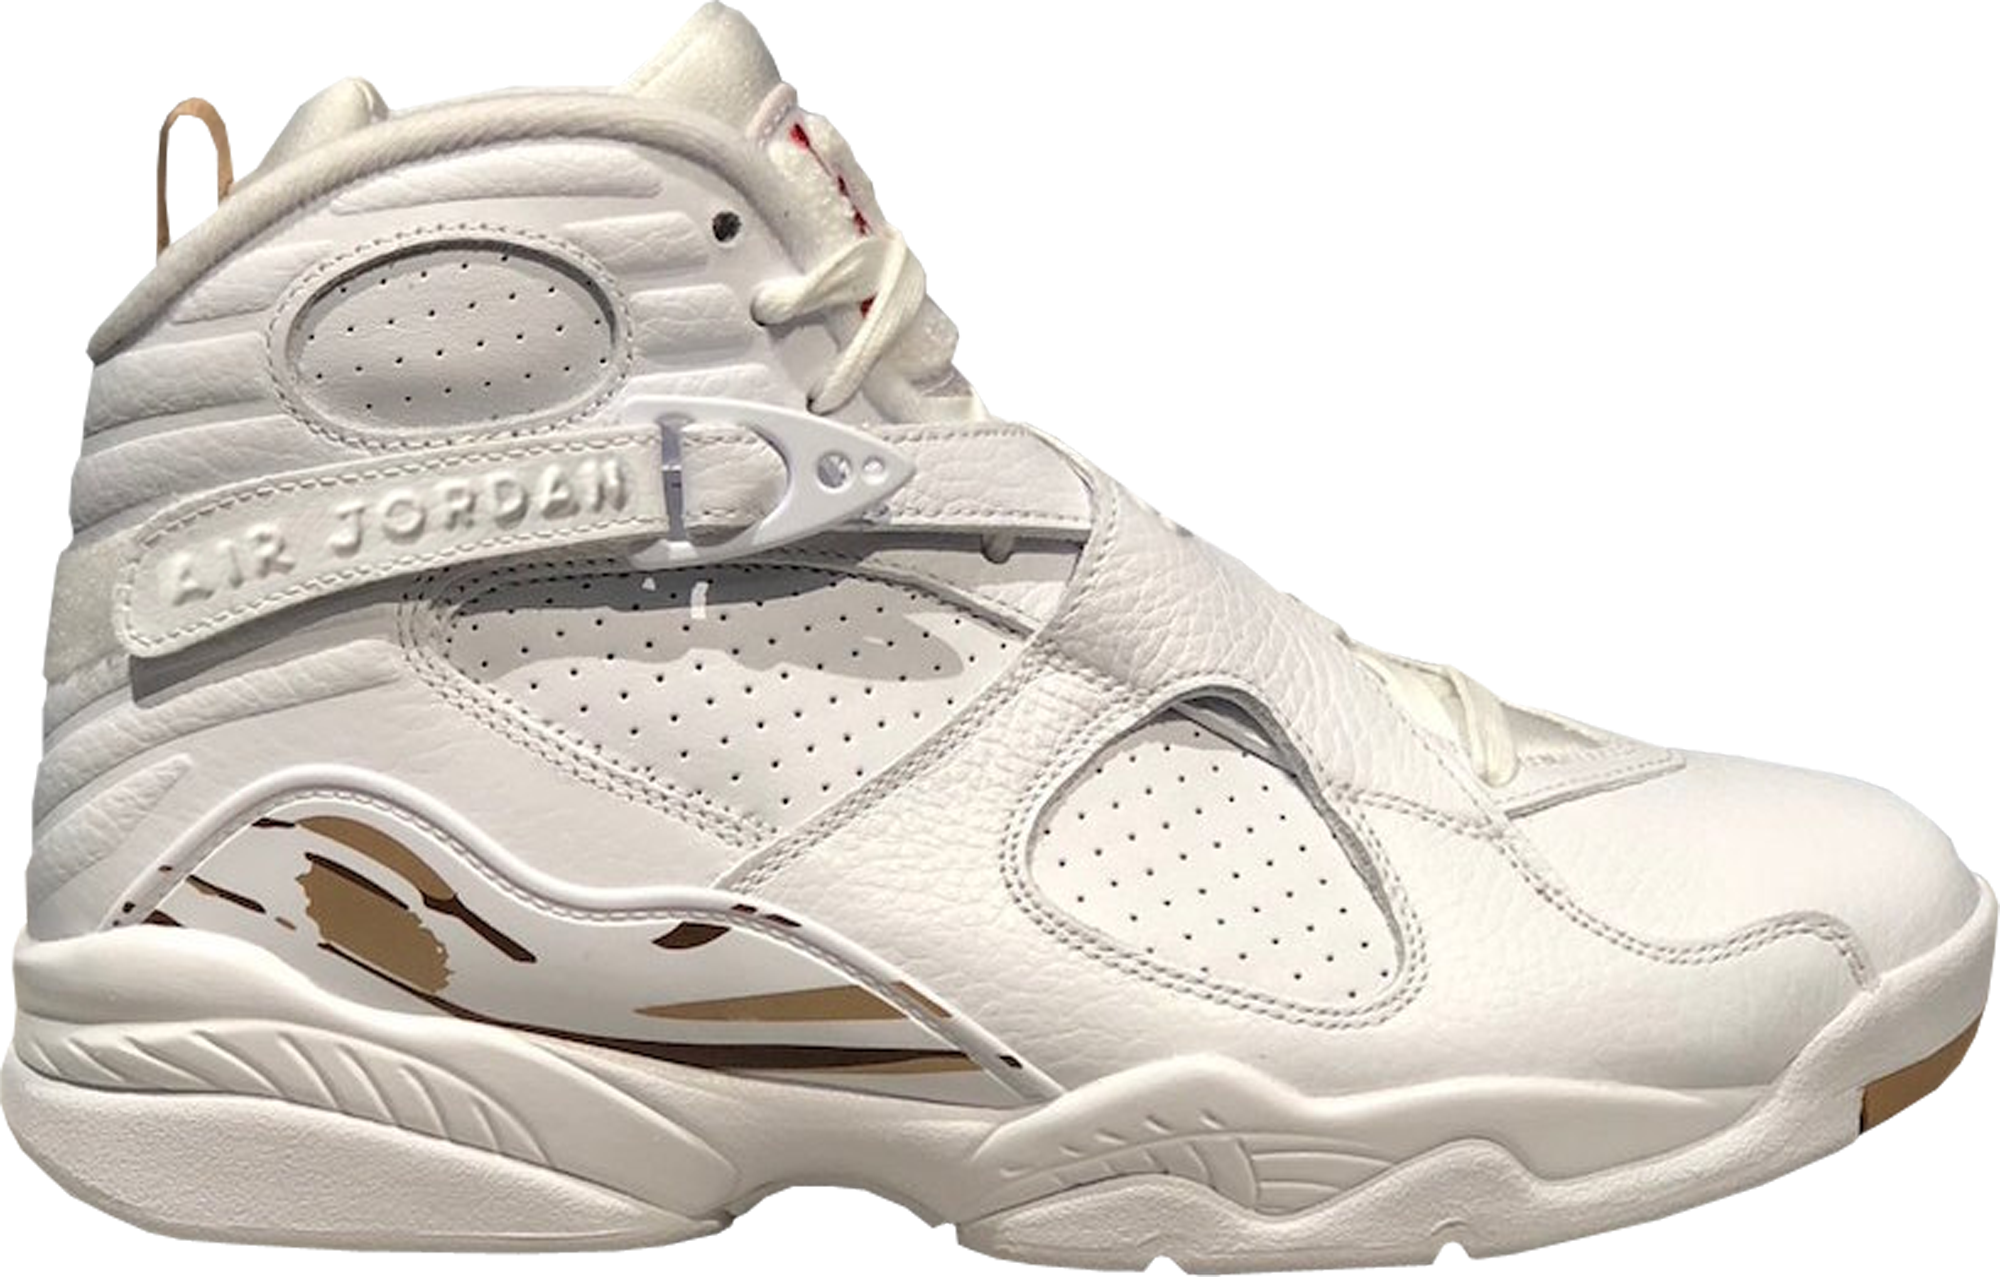 Air Jordan 8 Ovo Retro Stock X